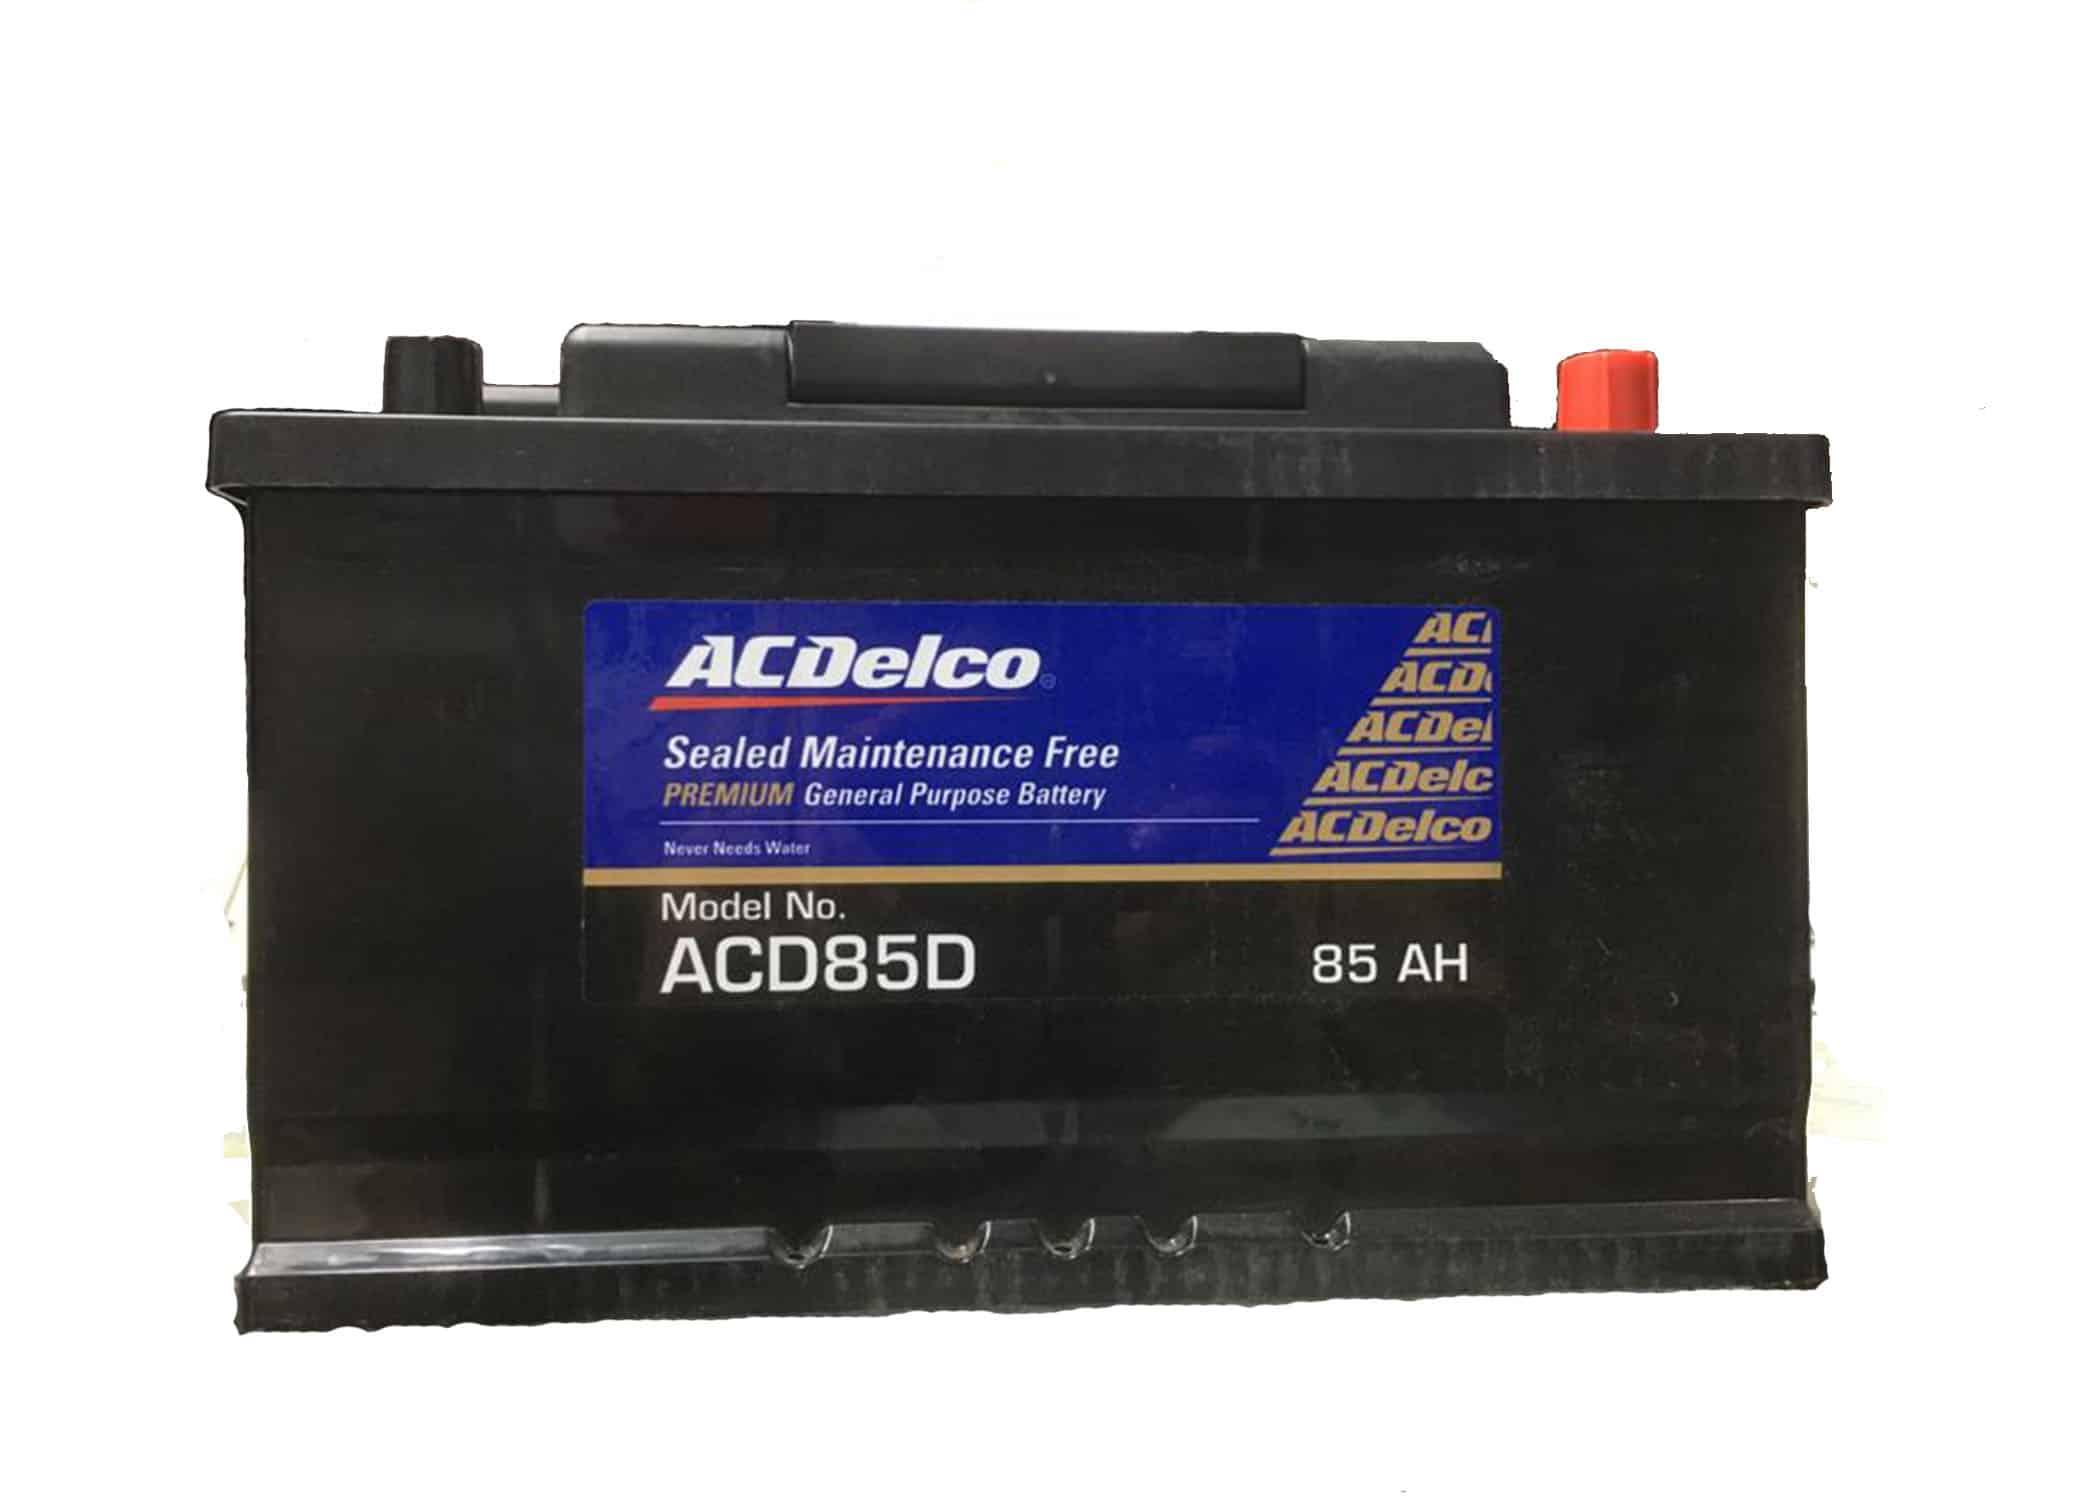 acdelco 85 ah, acdelco 85,acdelco battery , bmw battery , mercedes battery , od battery , acdelco battery in islamabad , lahore , karachi